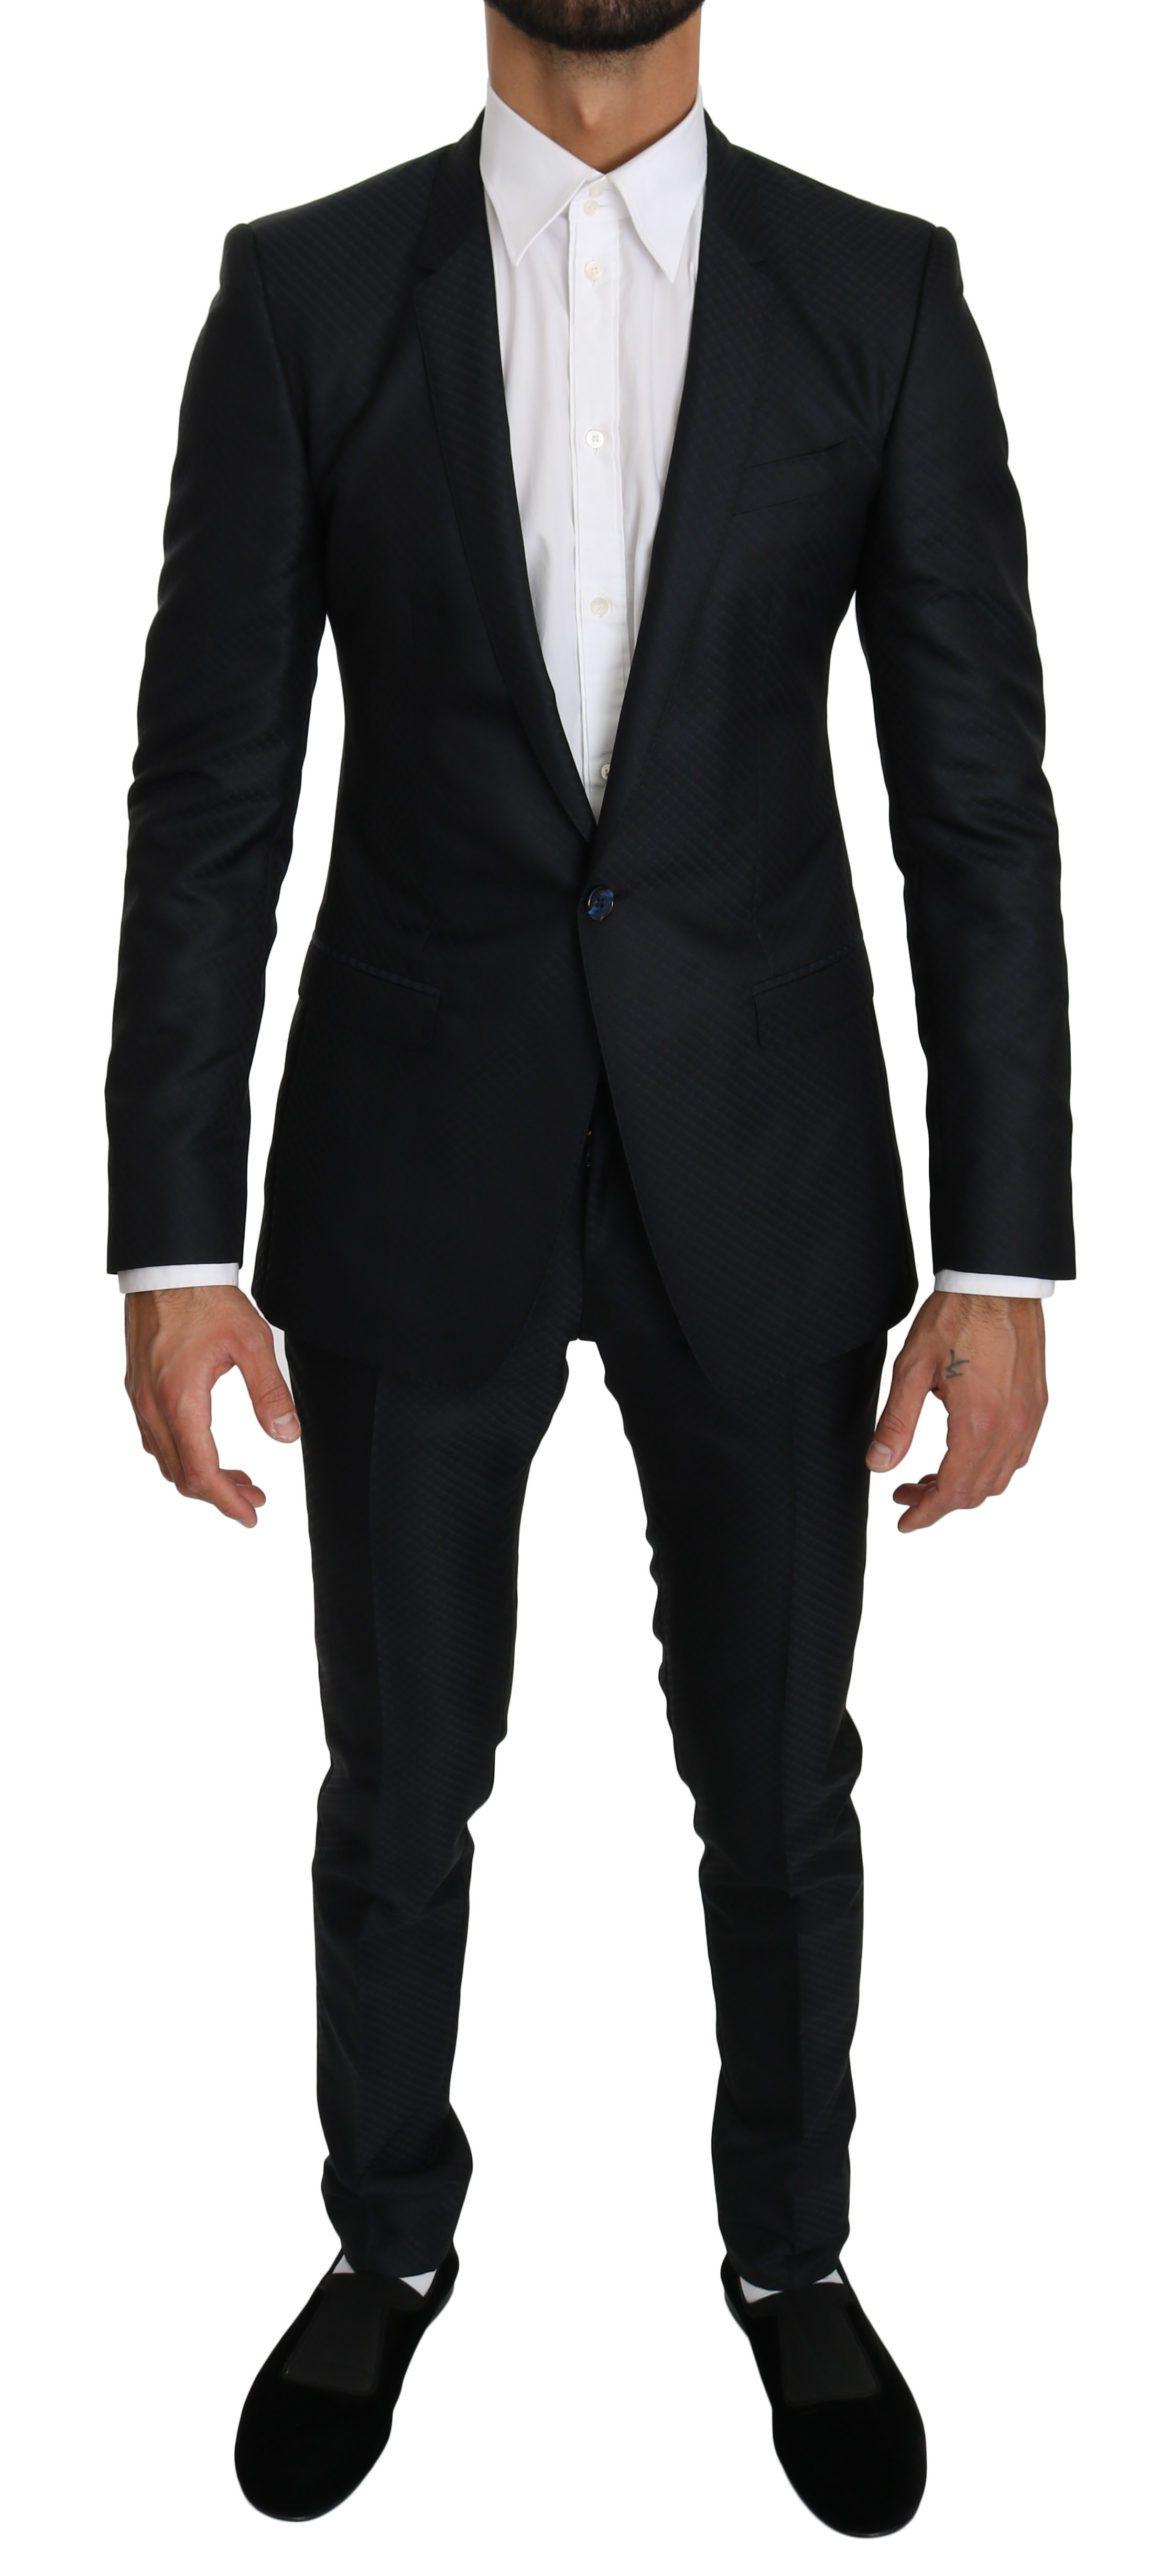 Dolce & Gabbana Men's GOLD Slim Fit Silk Wool Suit Blue KOS1542 - IT44 | XS